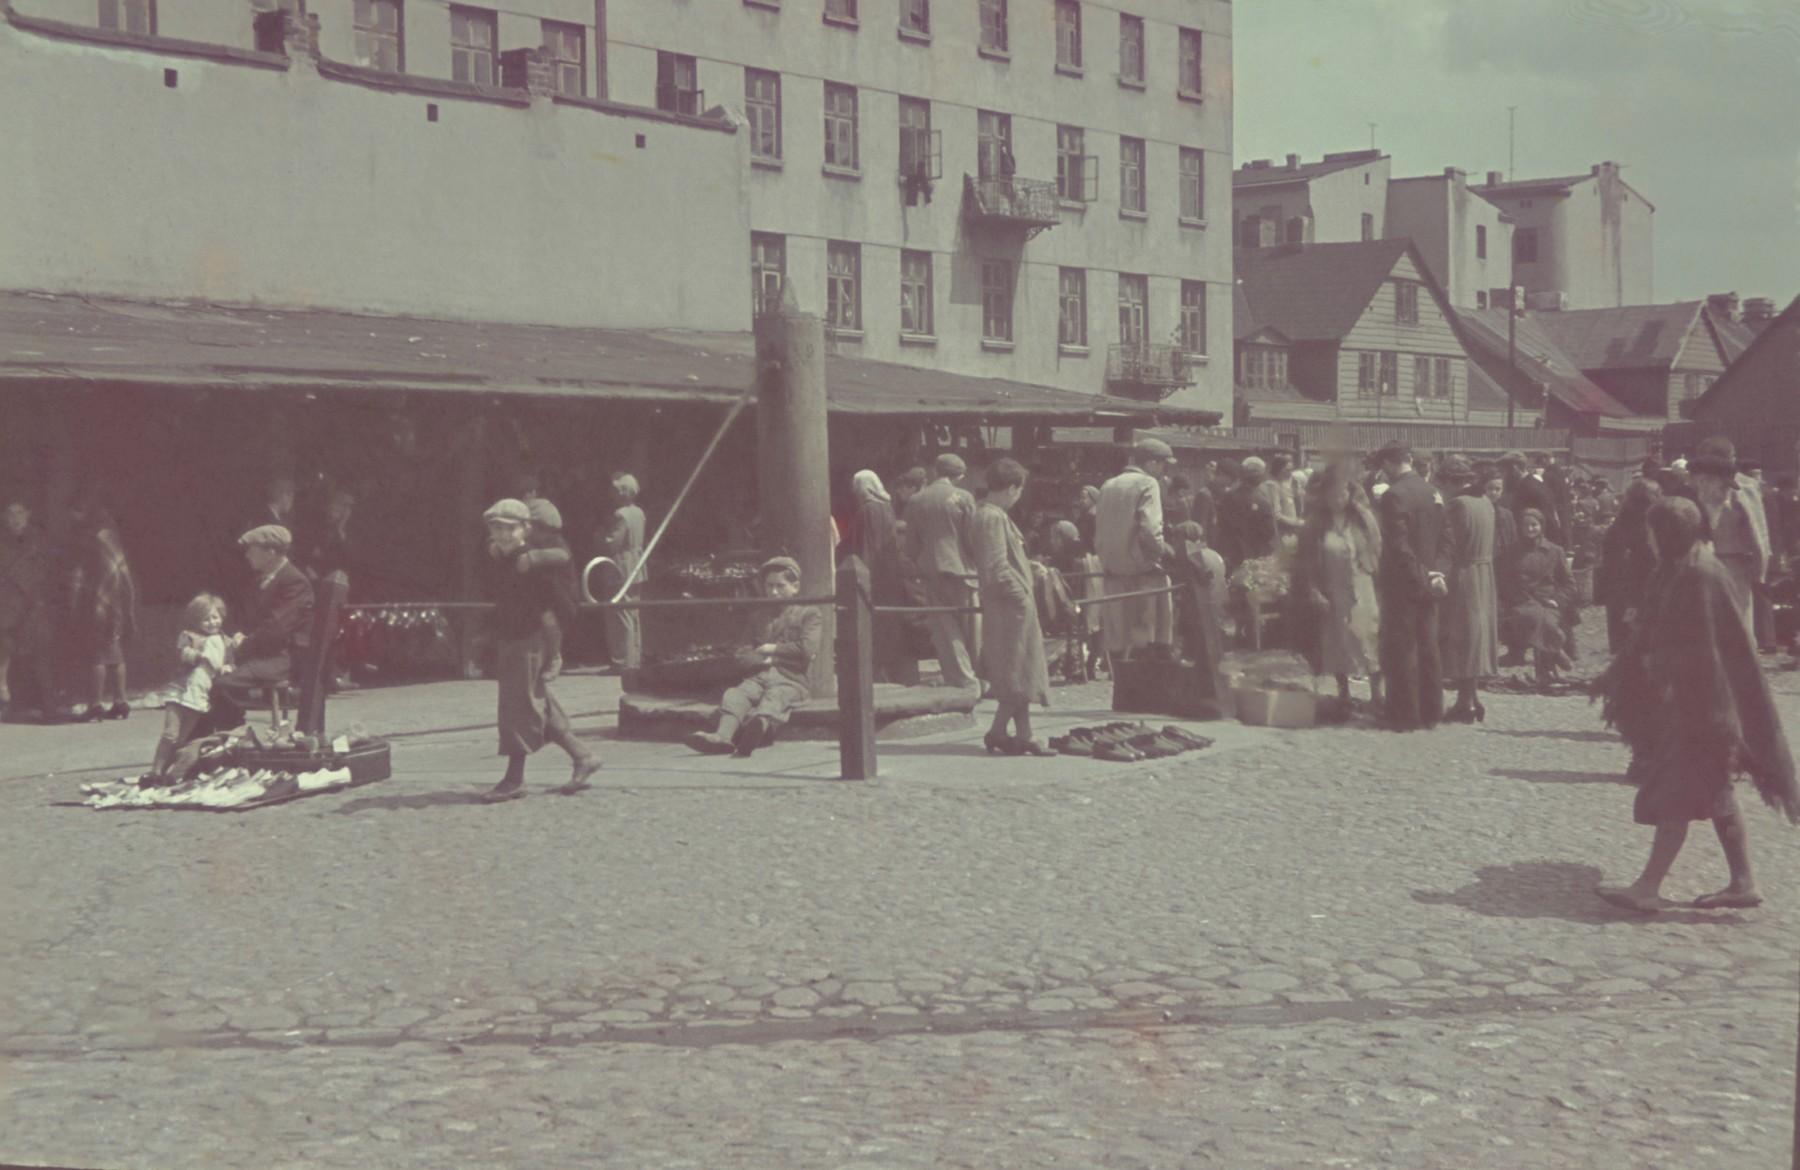 Pedestrians walk through an outdoor market in the Lodz ghetto.